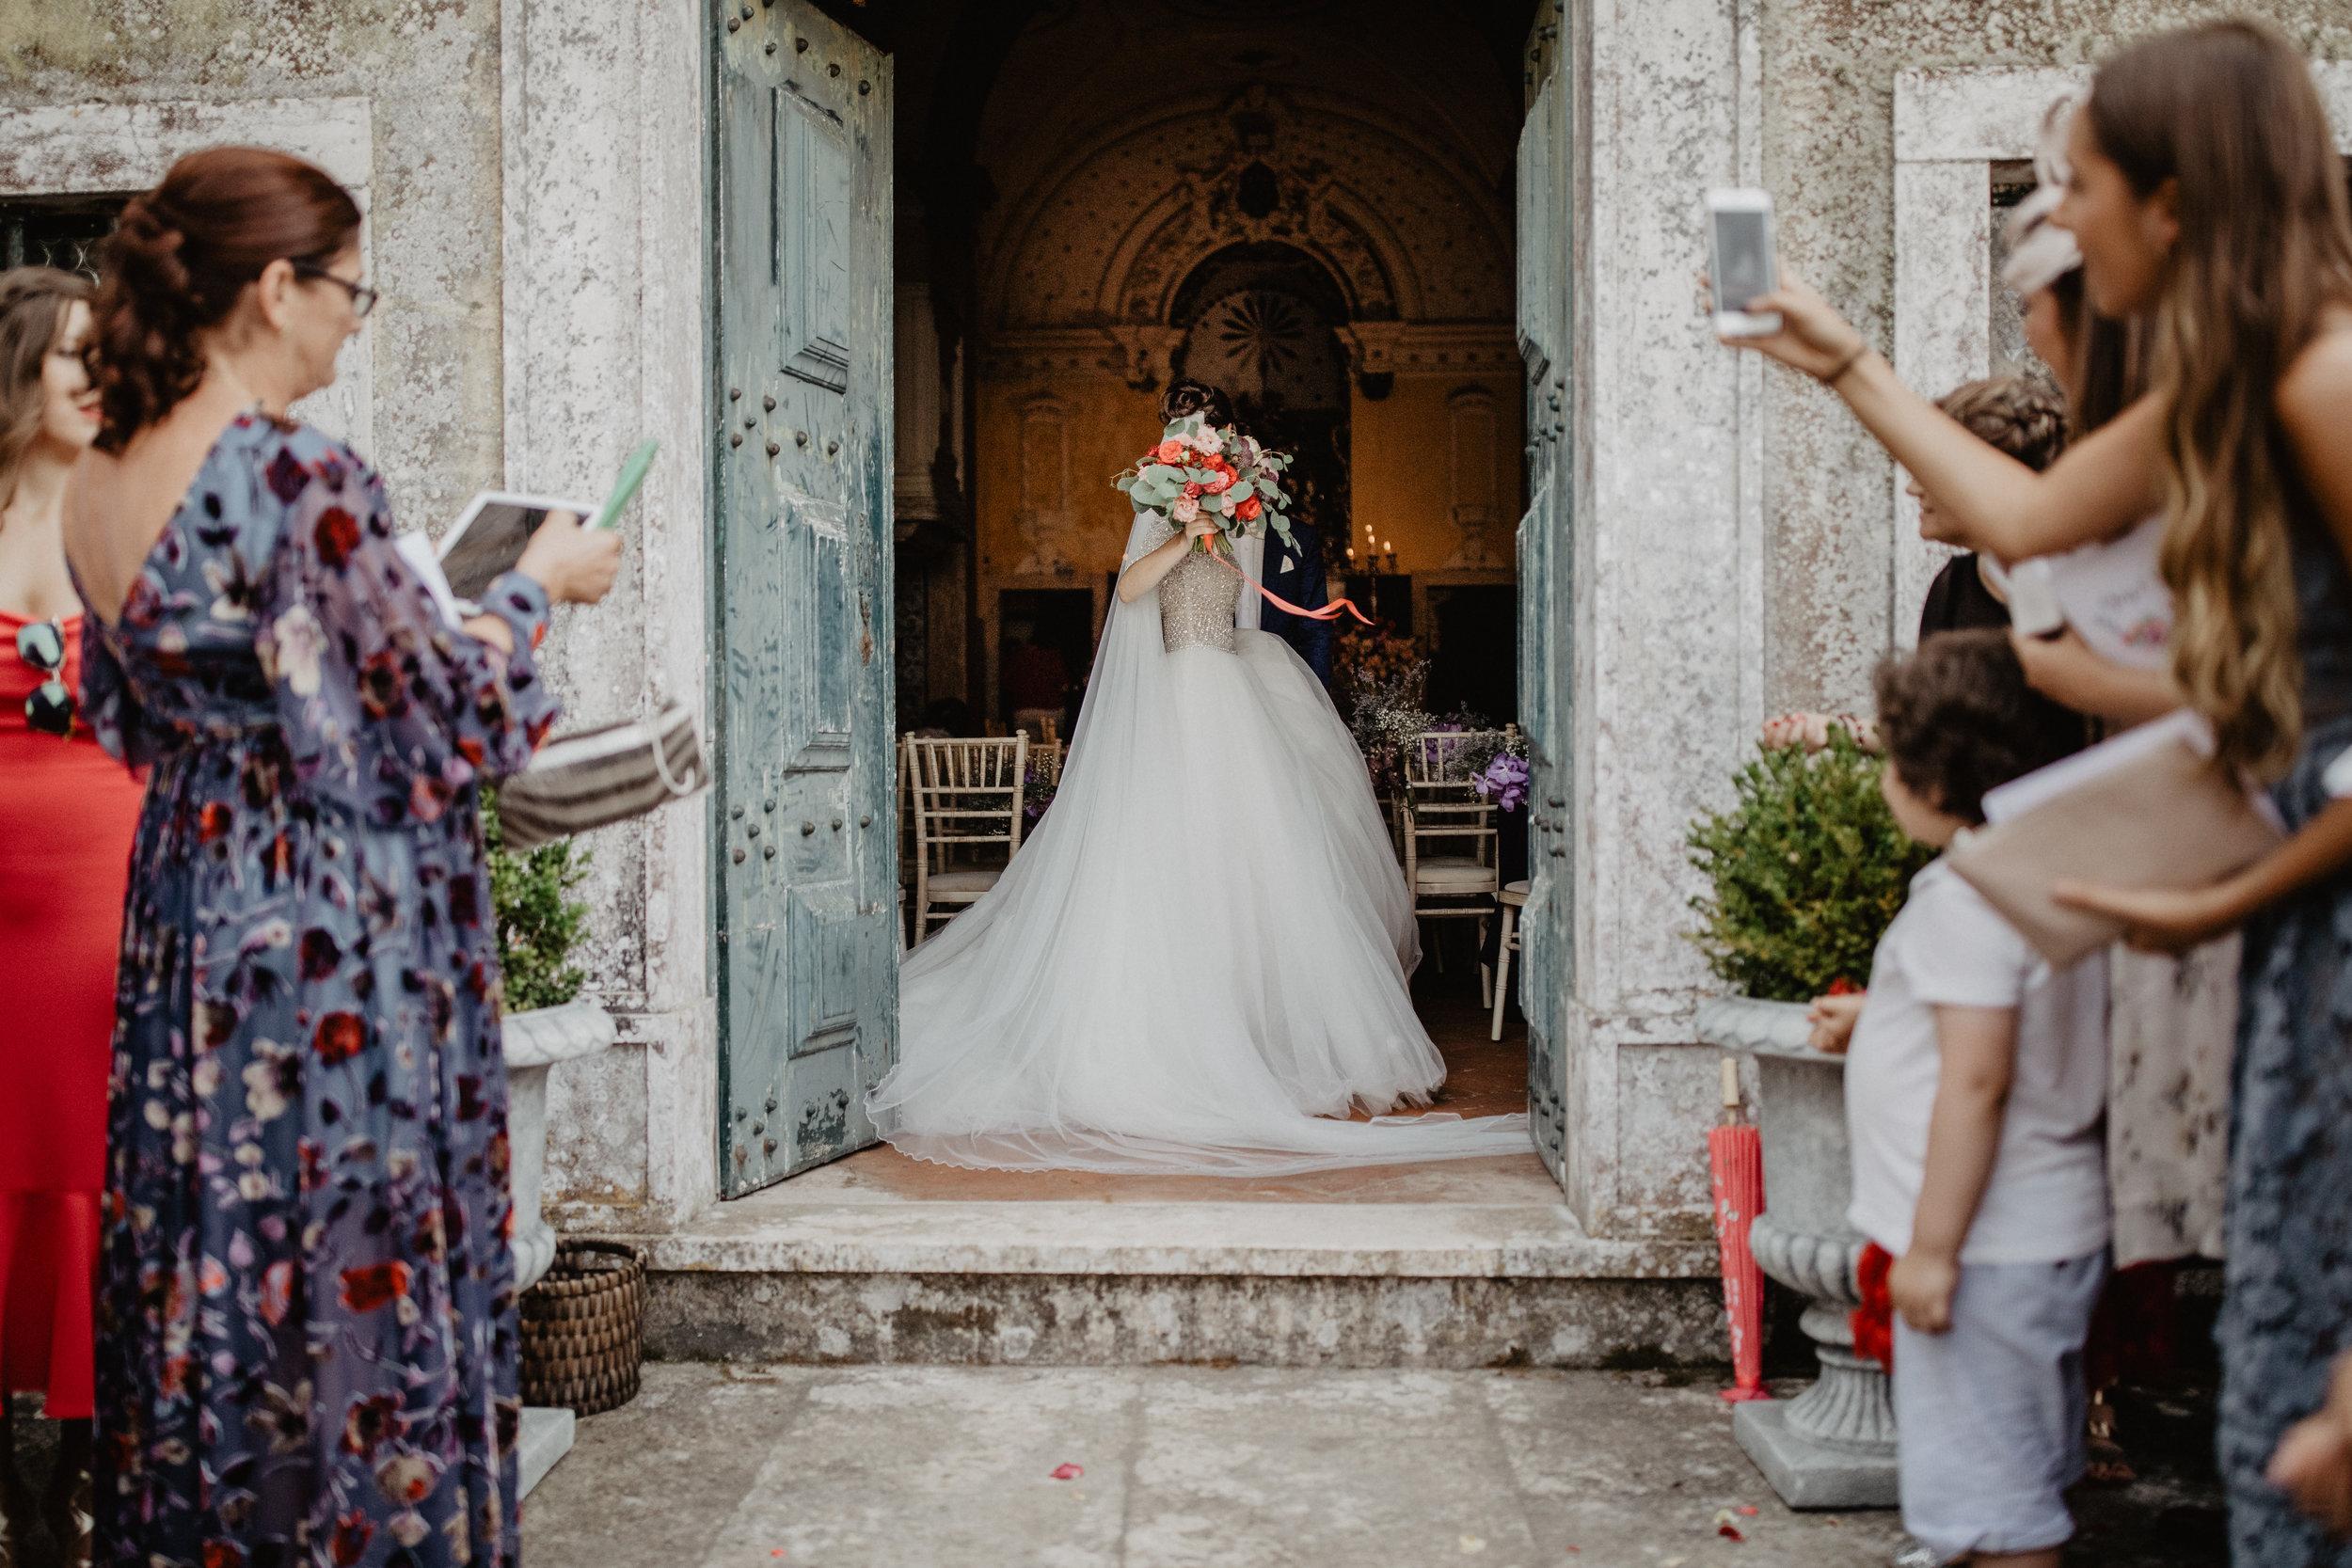 Lapela-photography-wedding-sintra-portugal-64.jpg